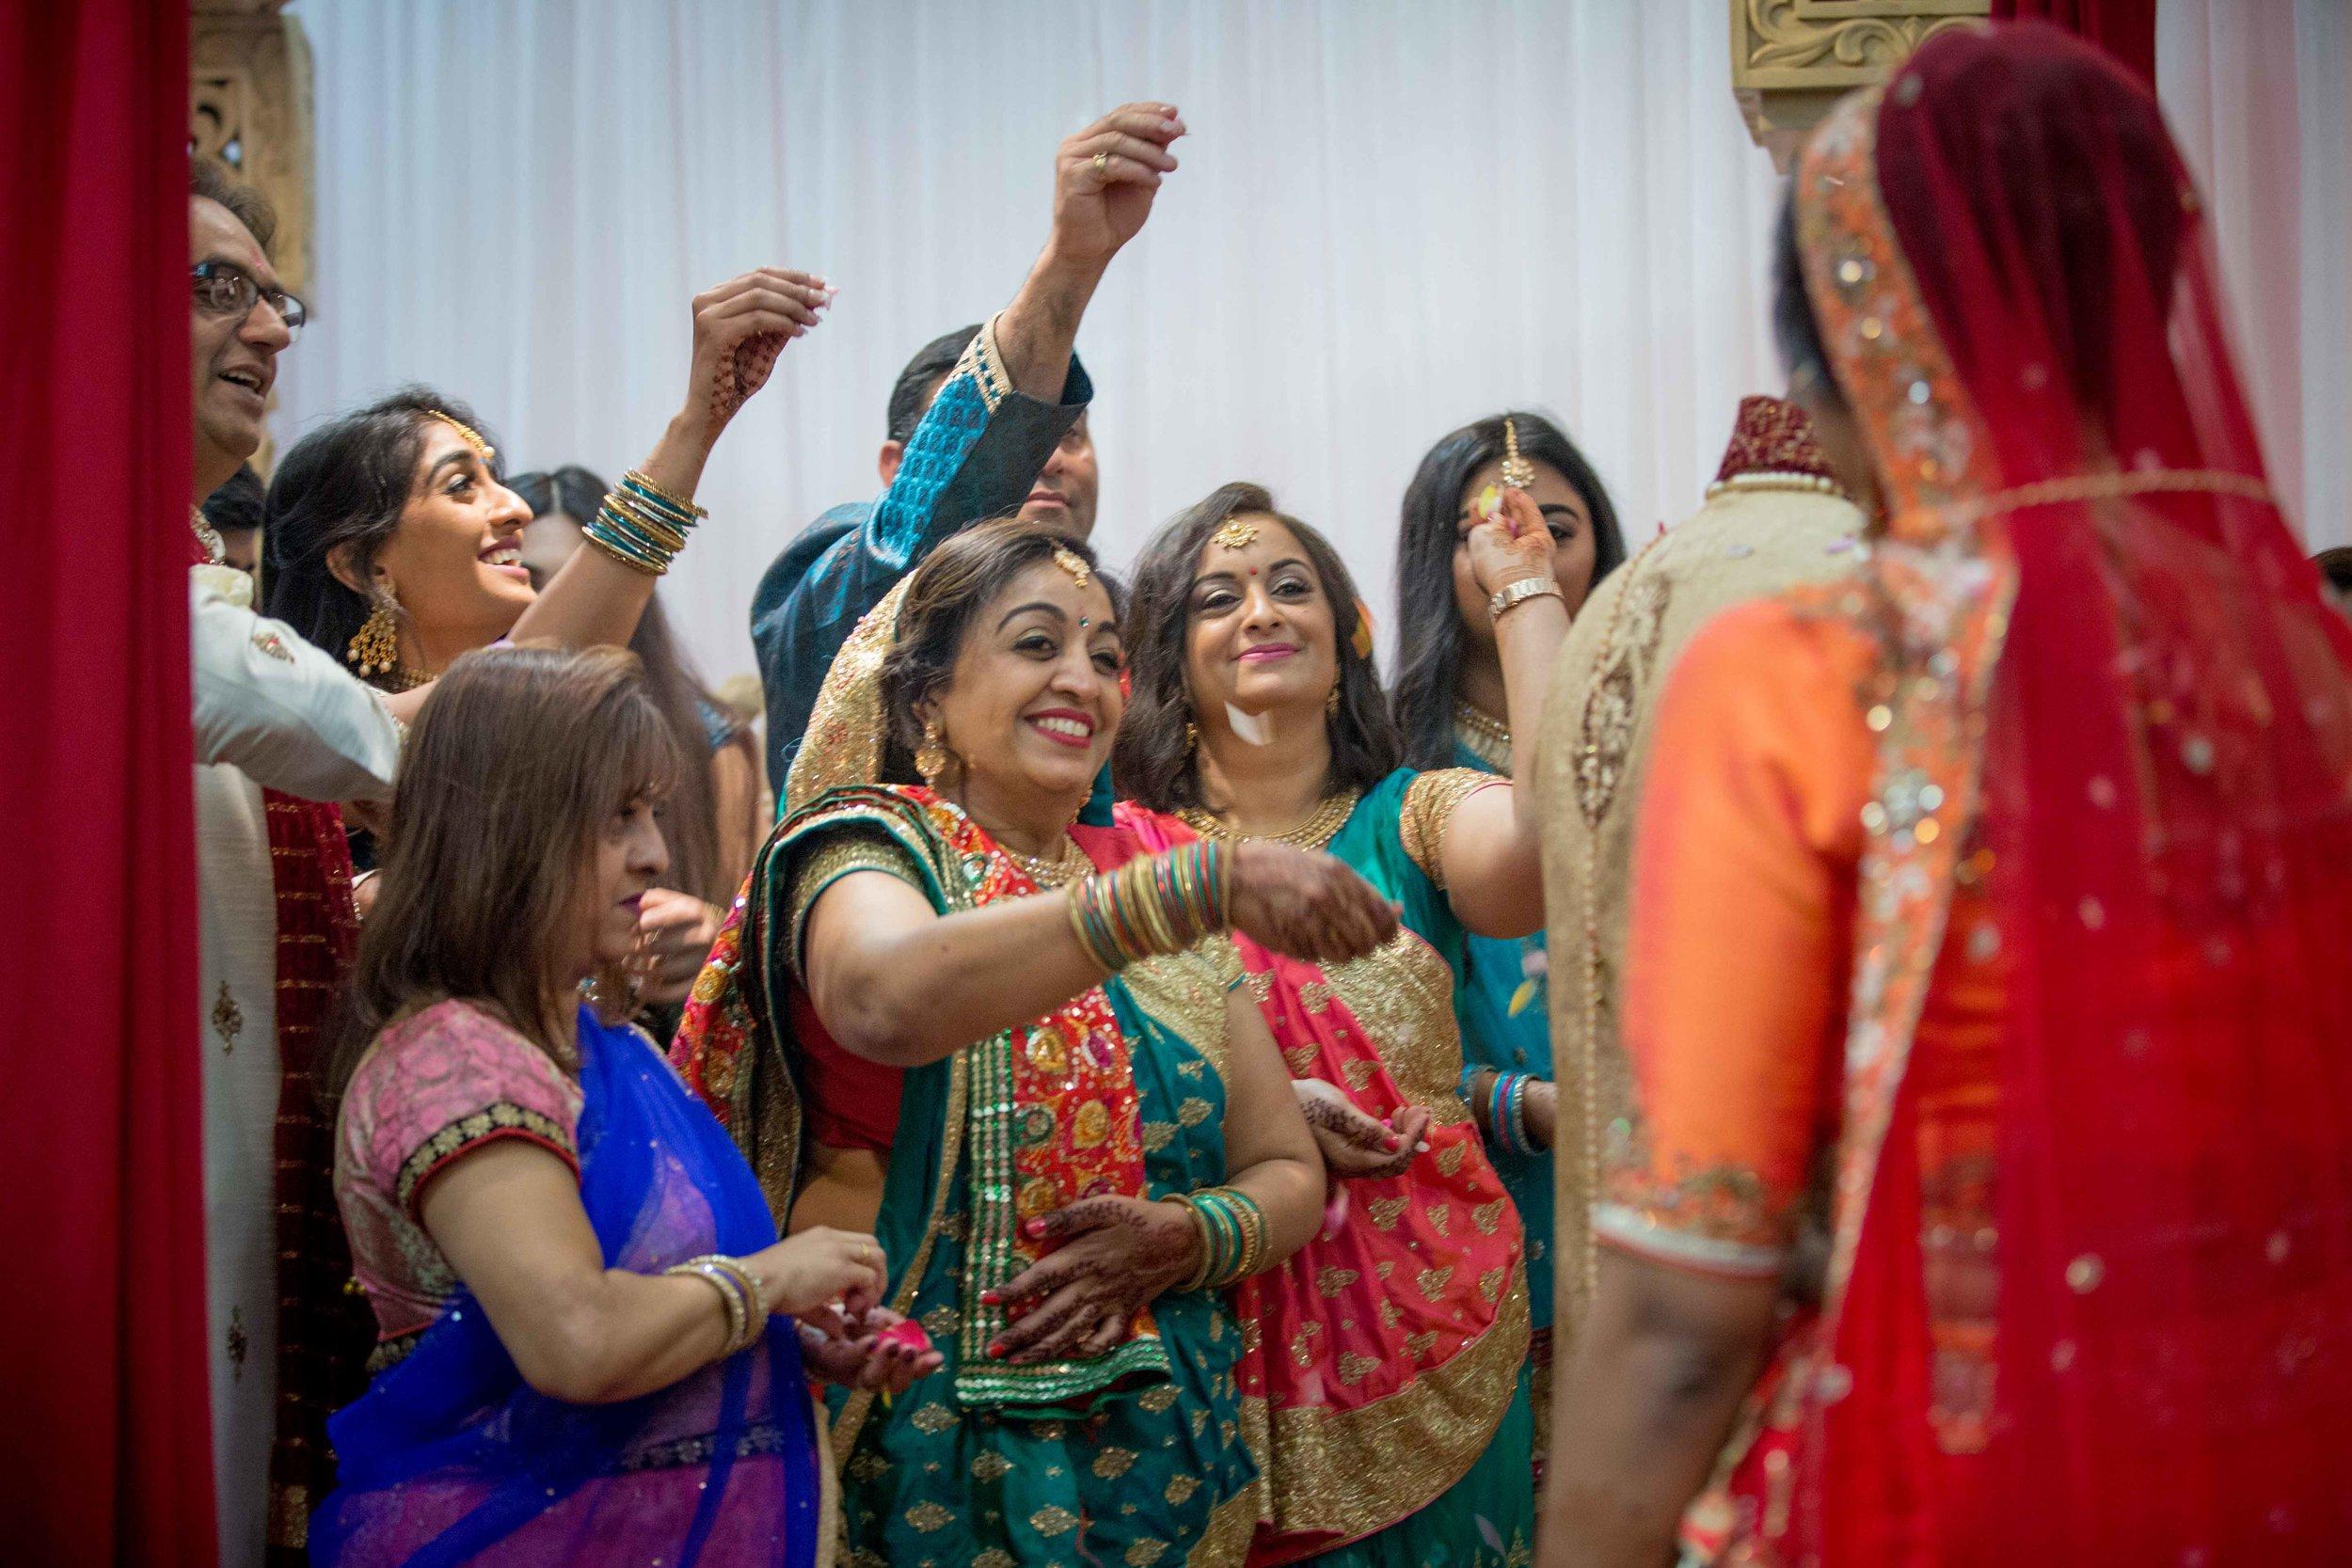 premier-banquetting-london-Hindu-asian-wedding-photographer-natalia-smith-photography-27.jpg